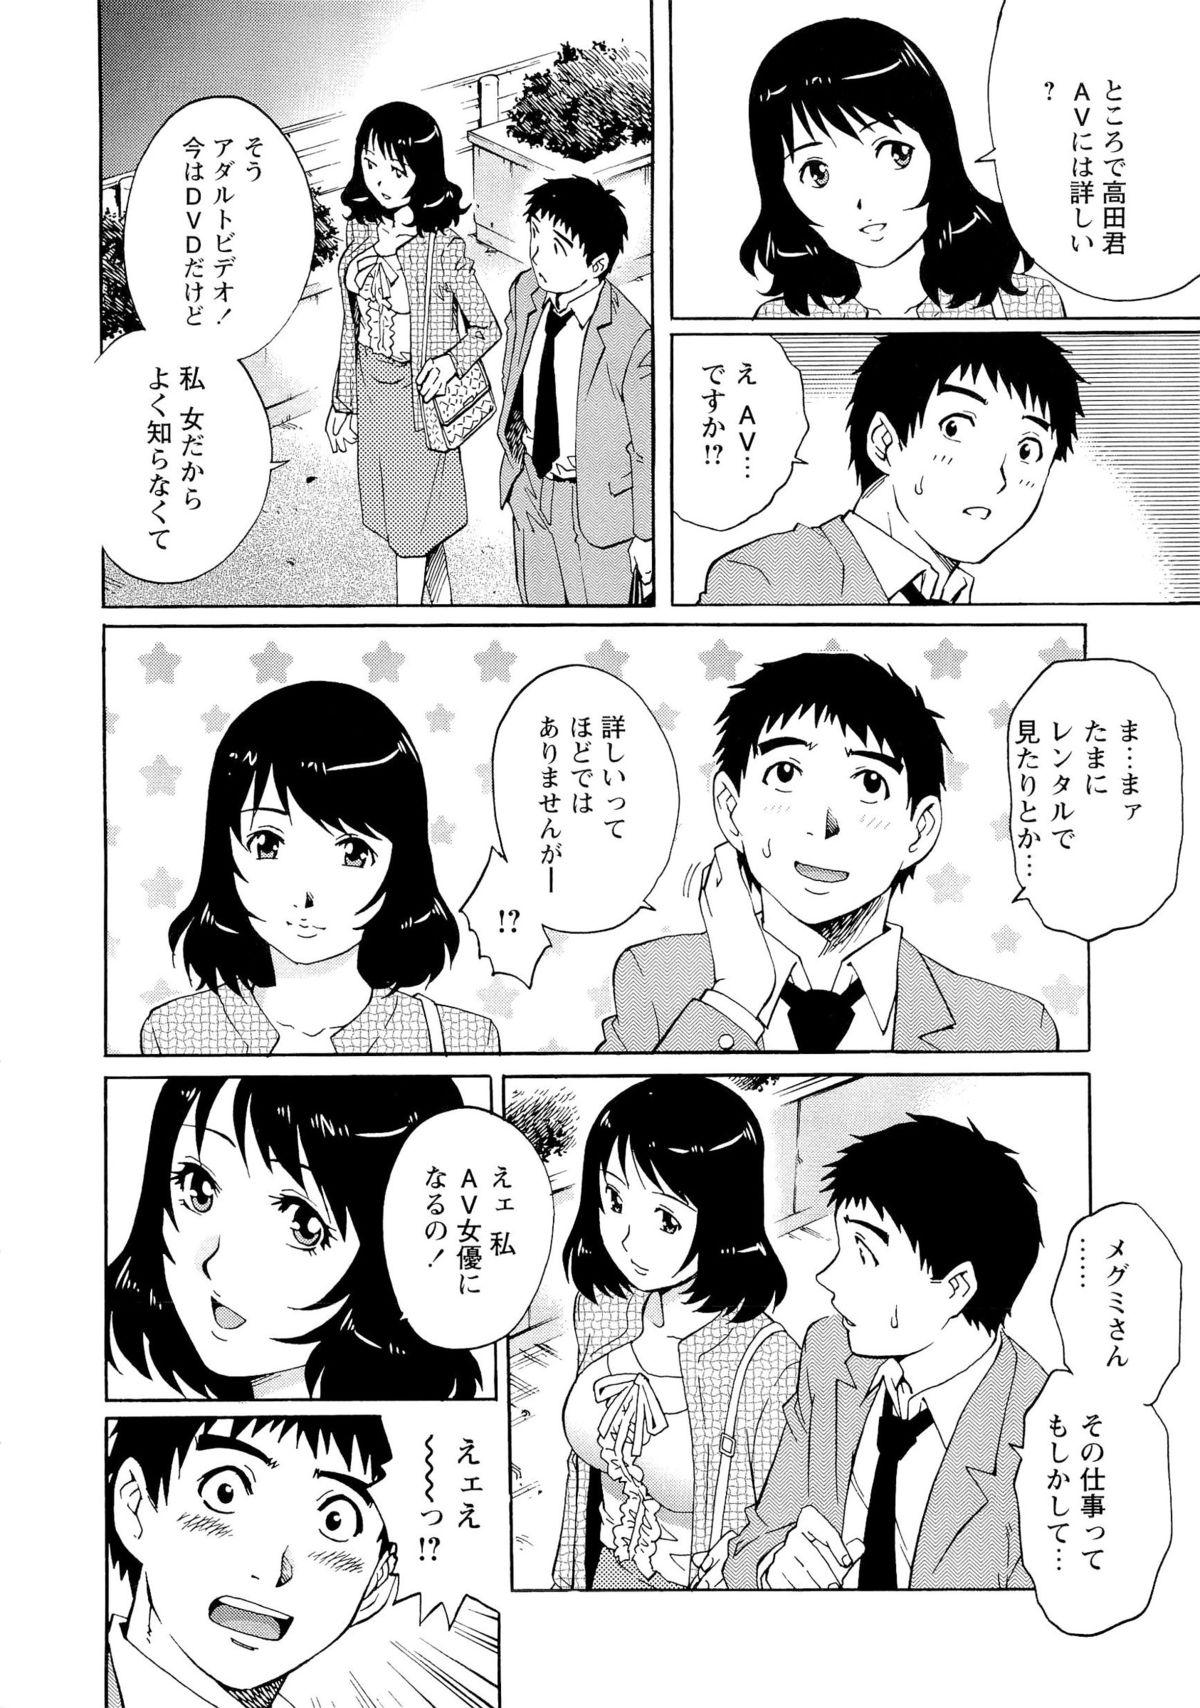 Nureteru Hitozuma - Wetly Wife 168